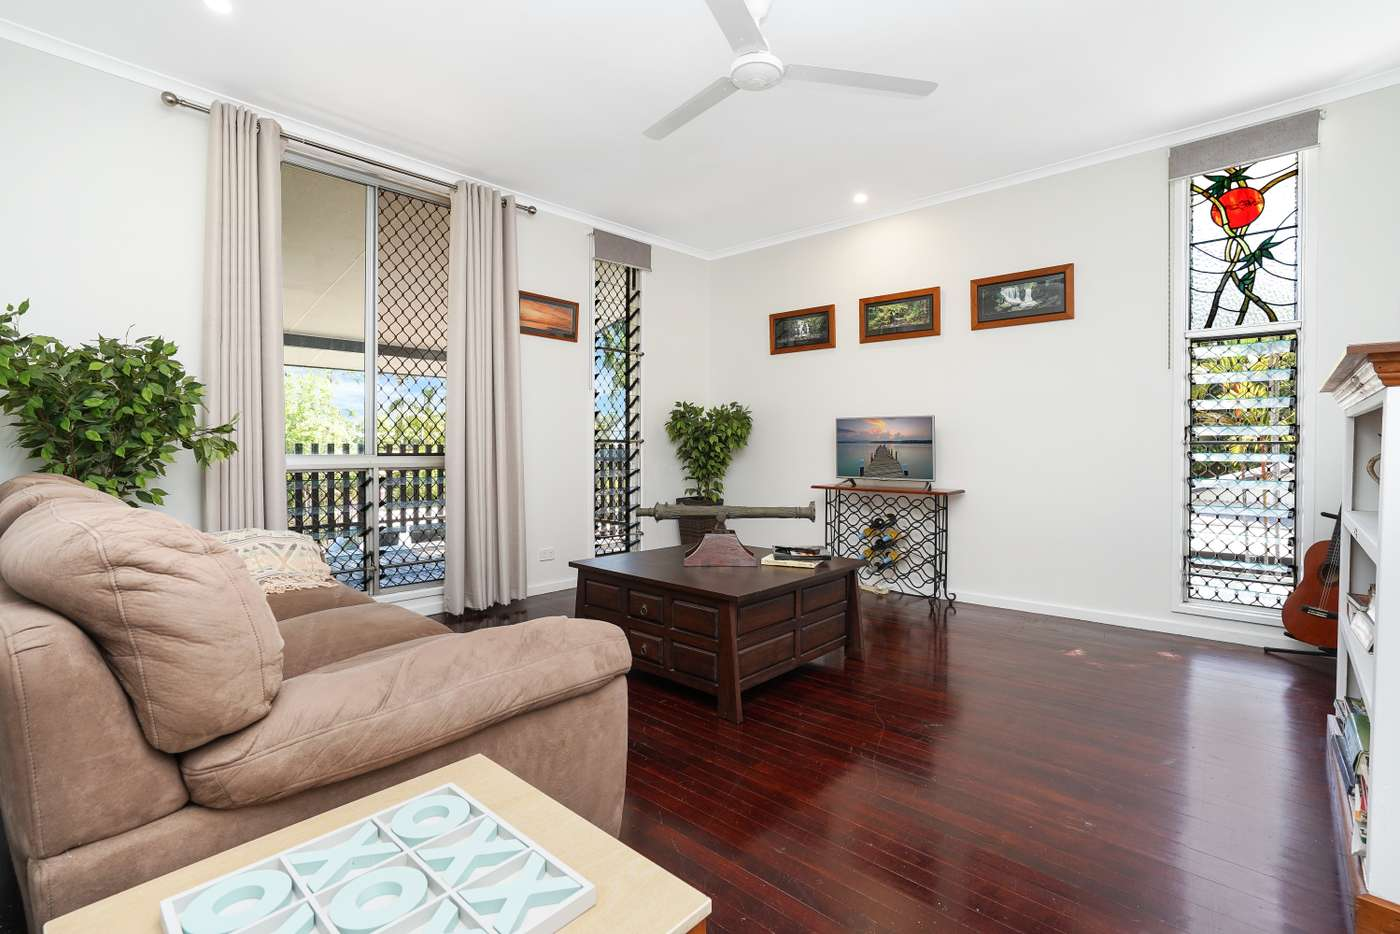 Sixth view of Homely house listing, 10 Croker Street, Nakara NT 810